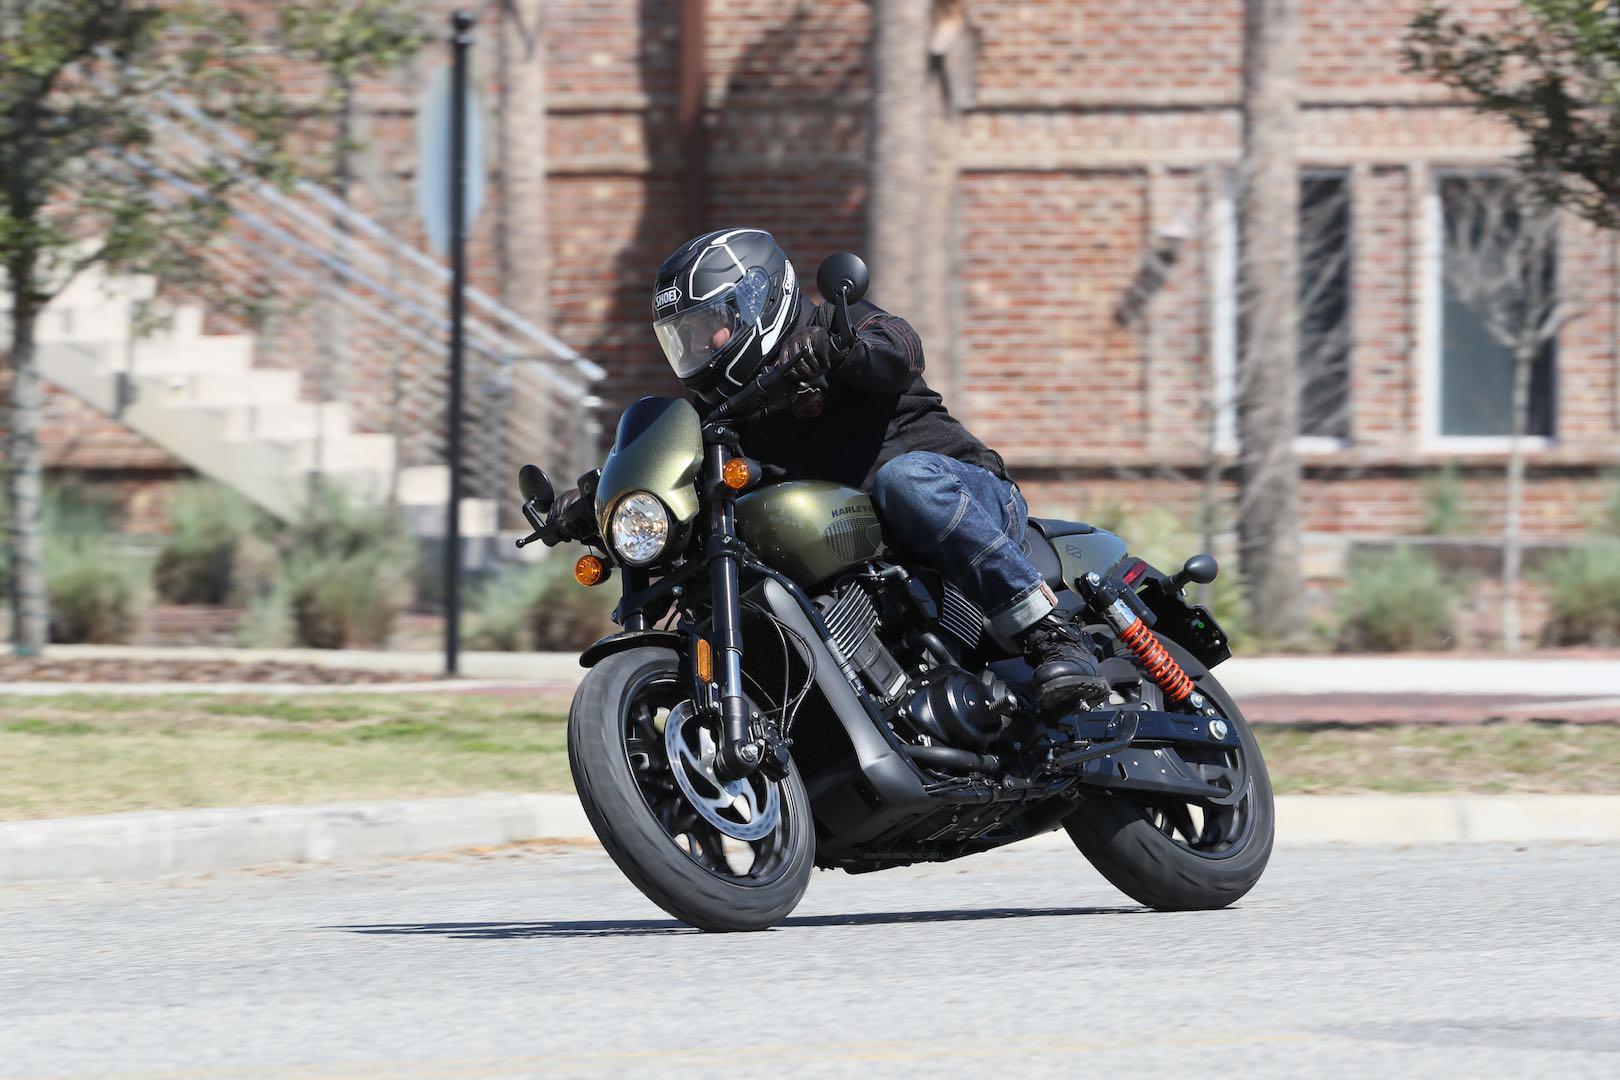 2017 Harley-Davidson Street Rod Specs